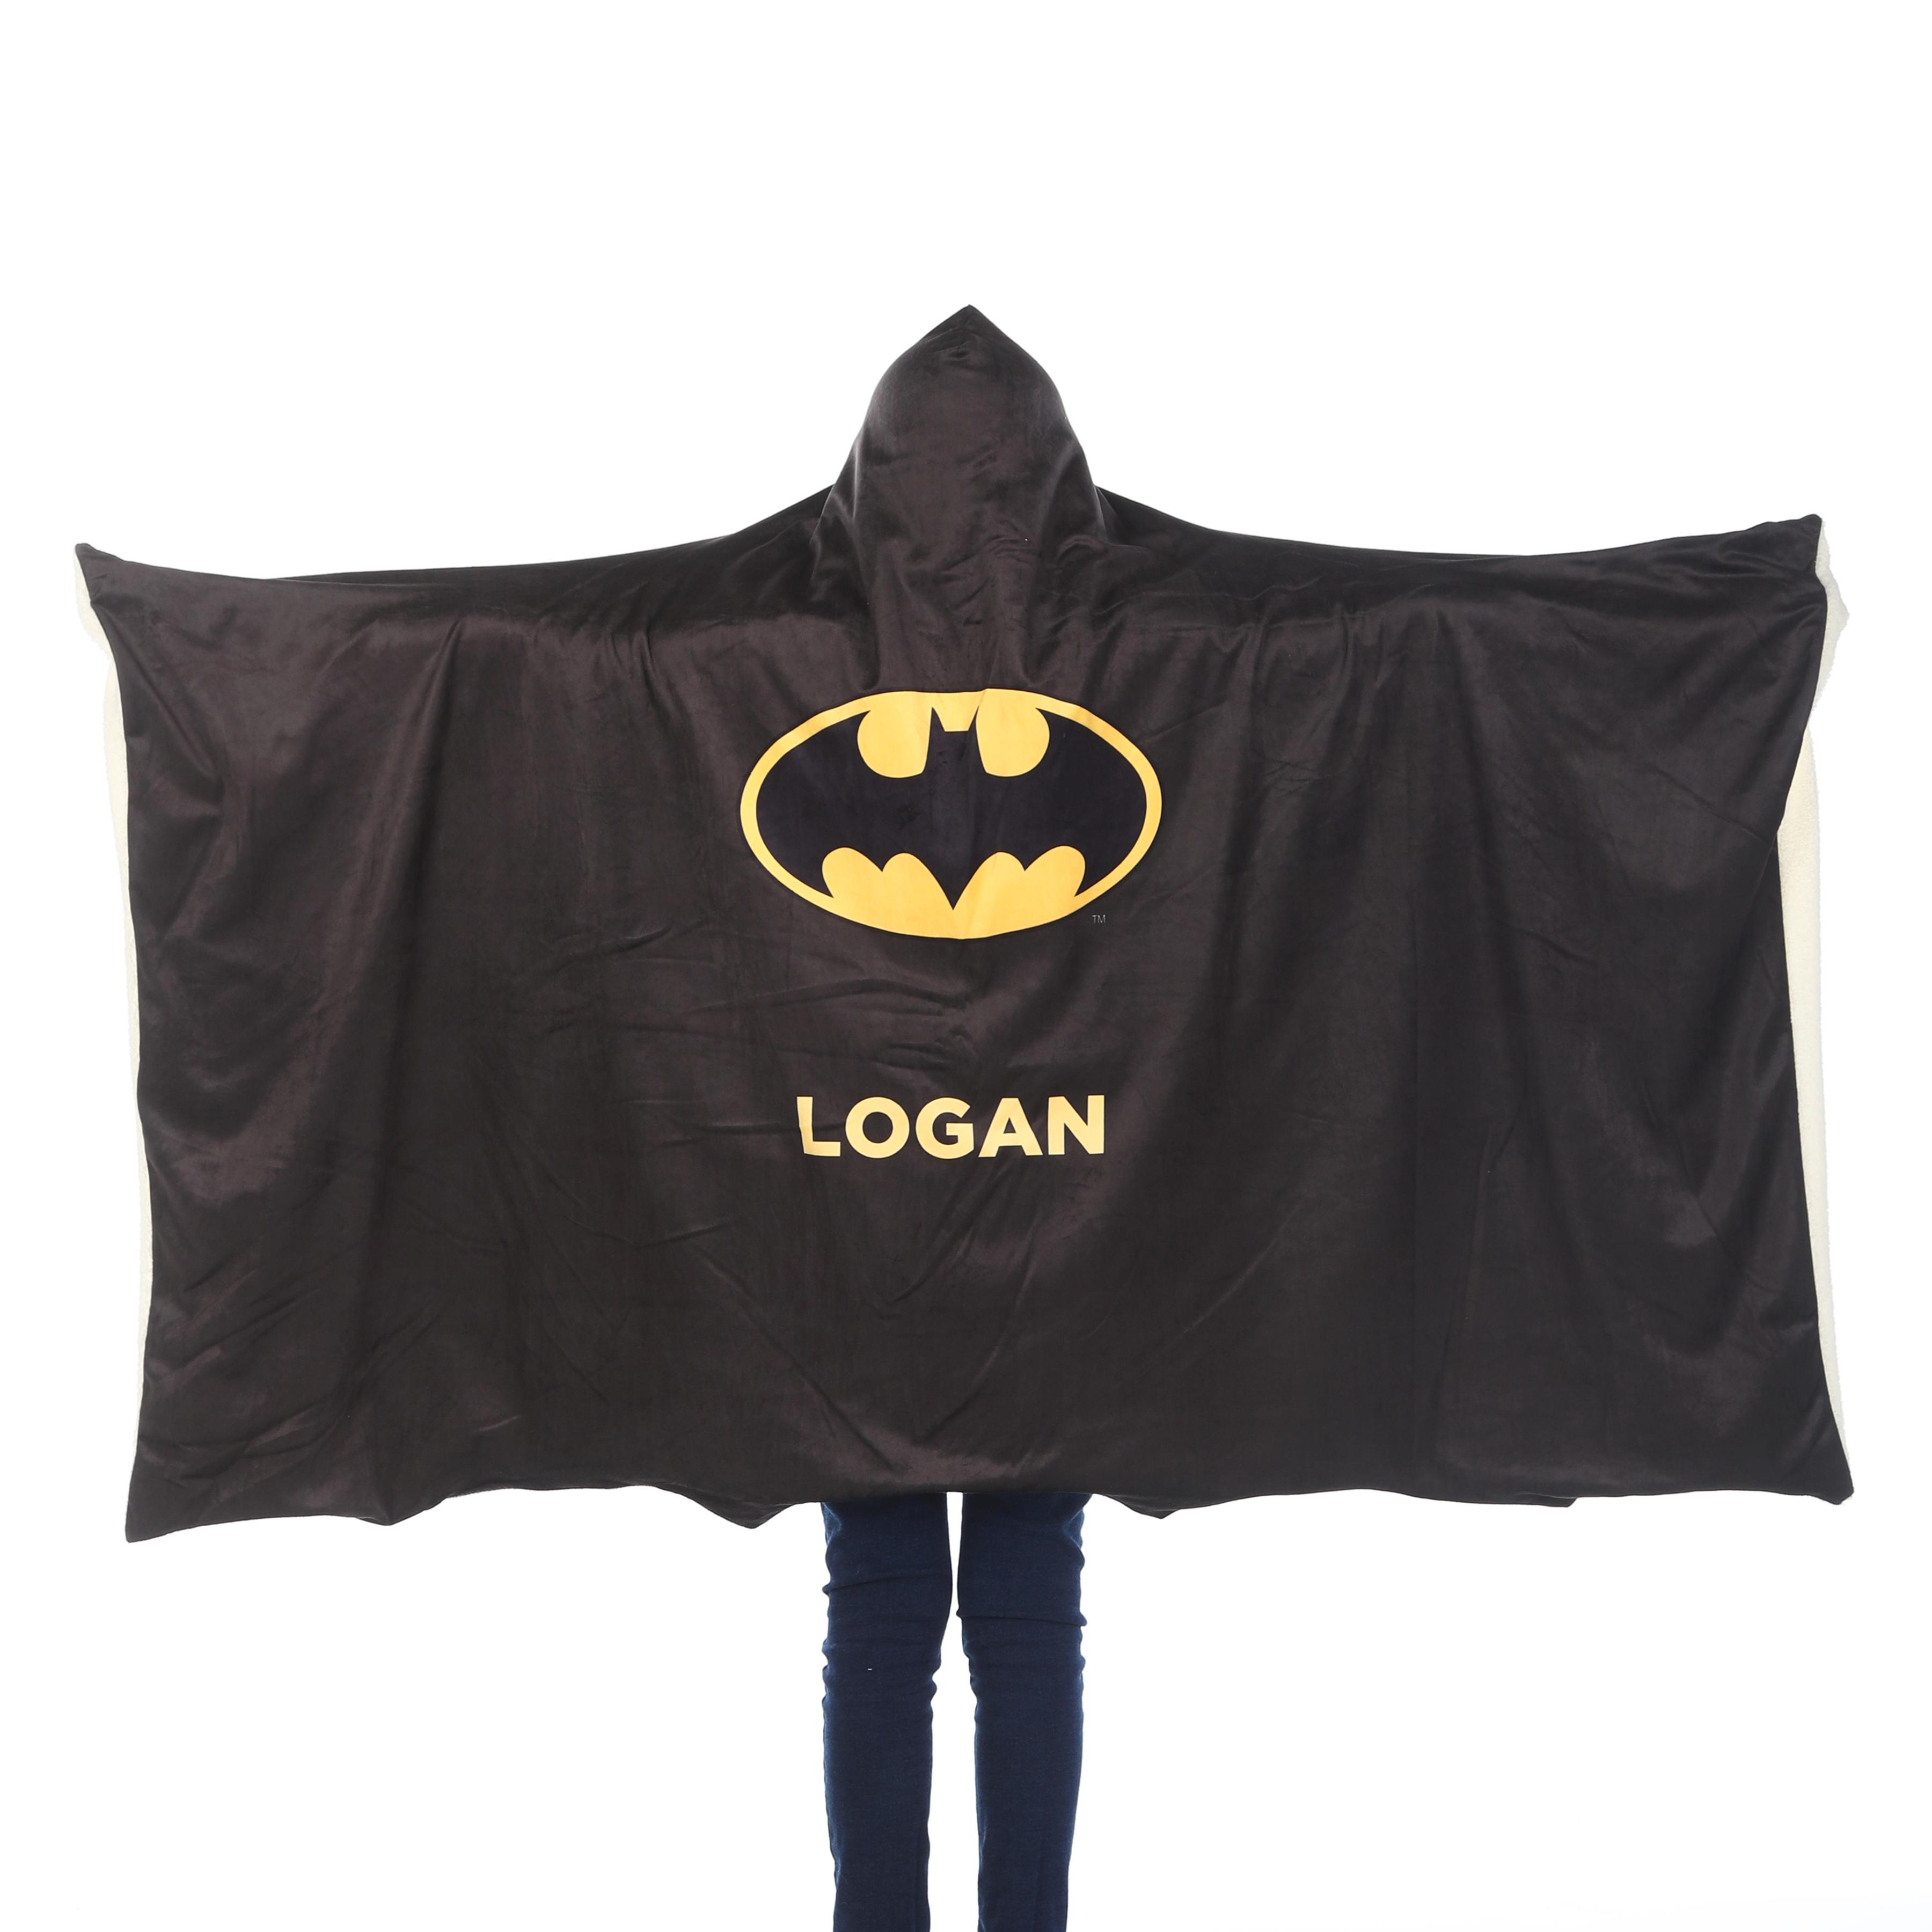 Batman™ Kids Hooded Blanket - Batman Cape